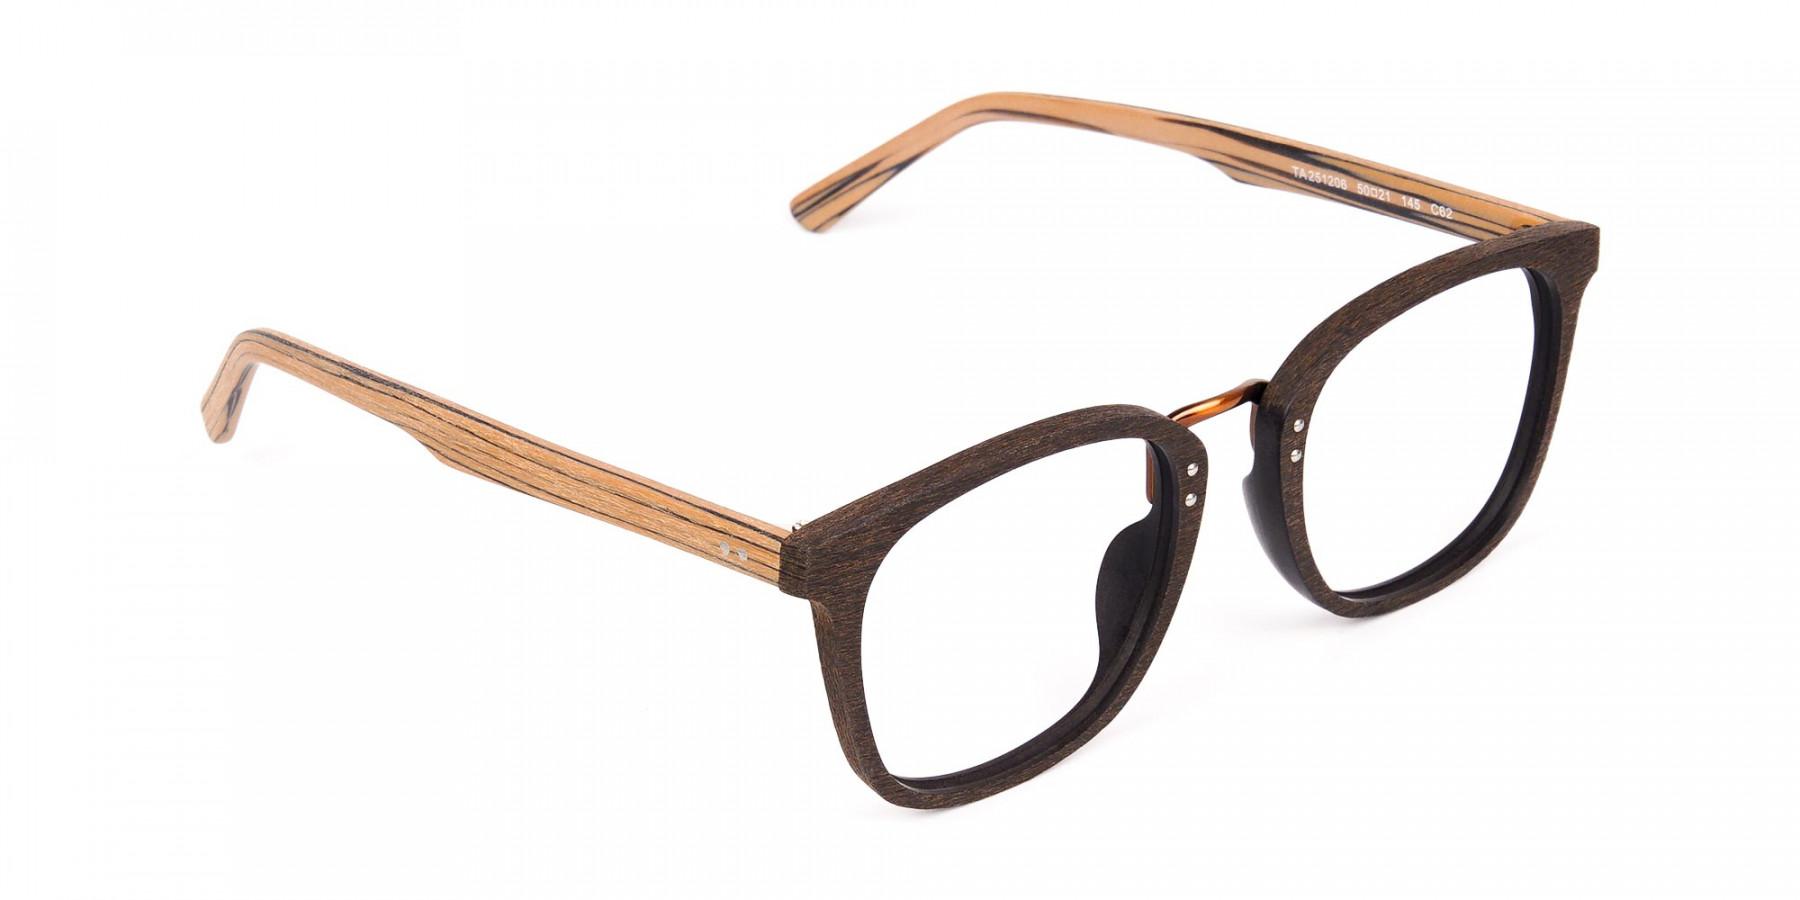 Wooden-Texture-Mocha-Brown-Rim-Glasses-1